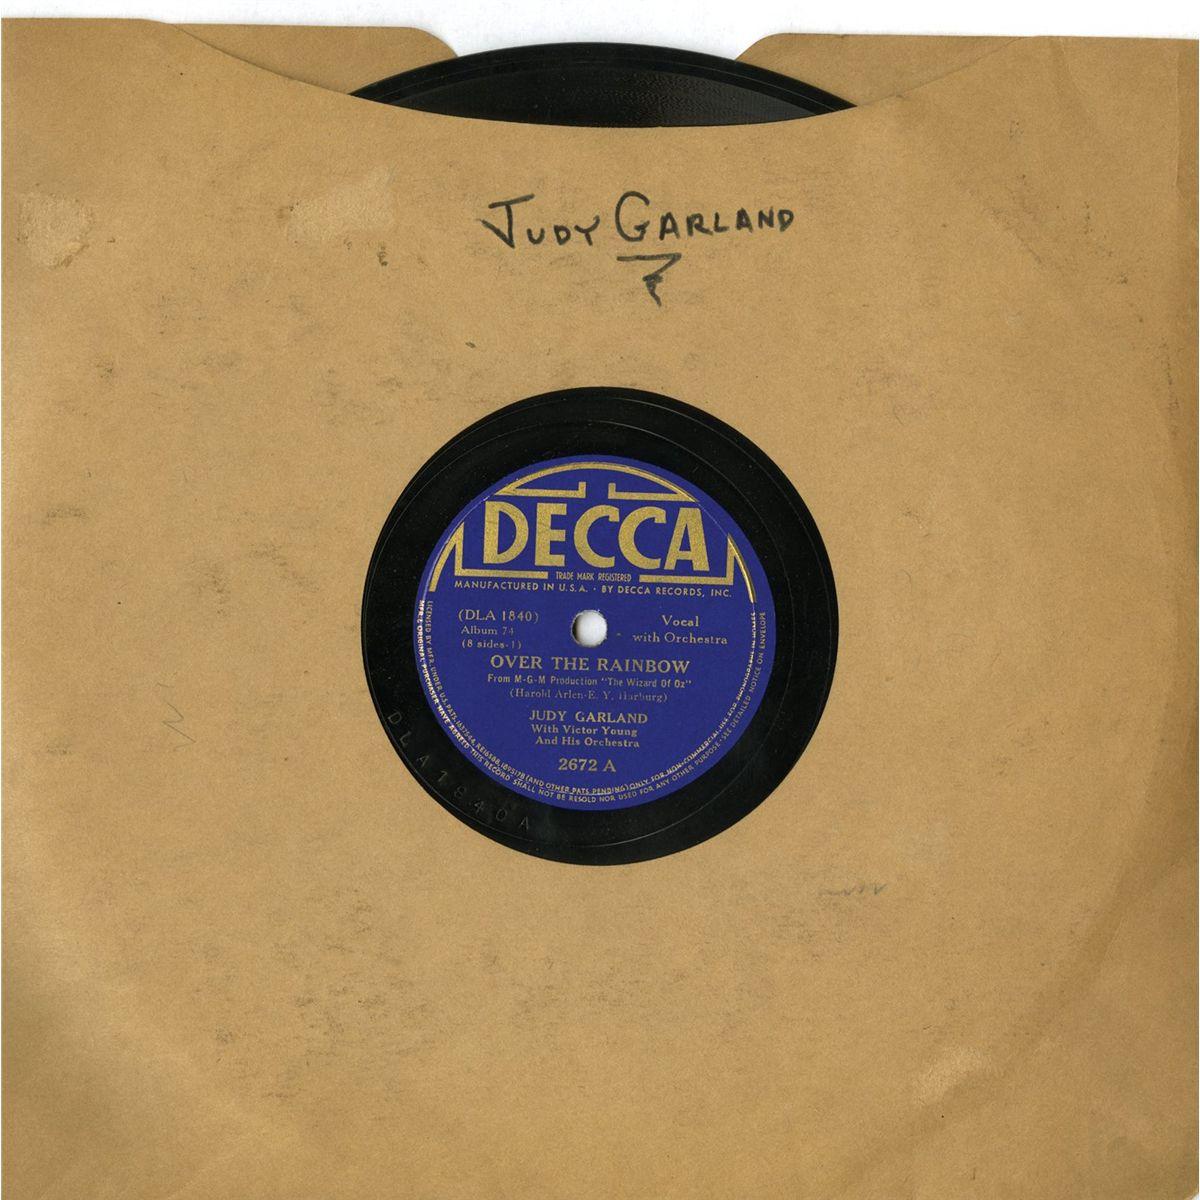 Judy Garland's personal copy of an original The Wizard of Oz Decca record  album set